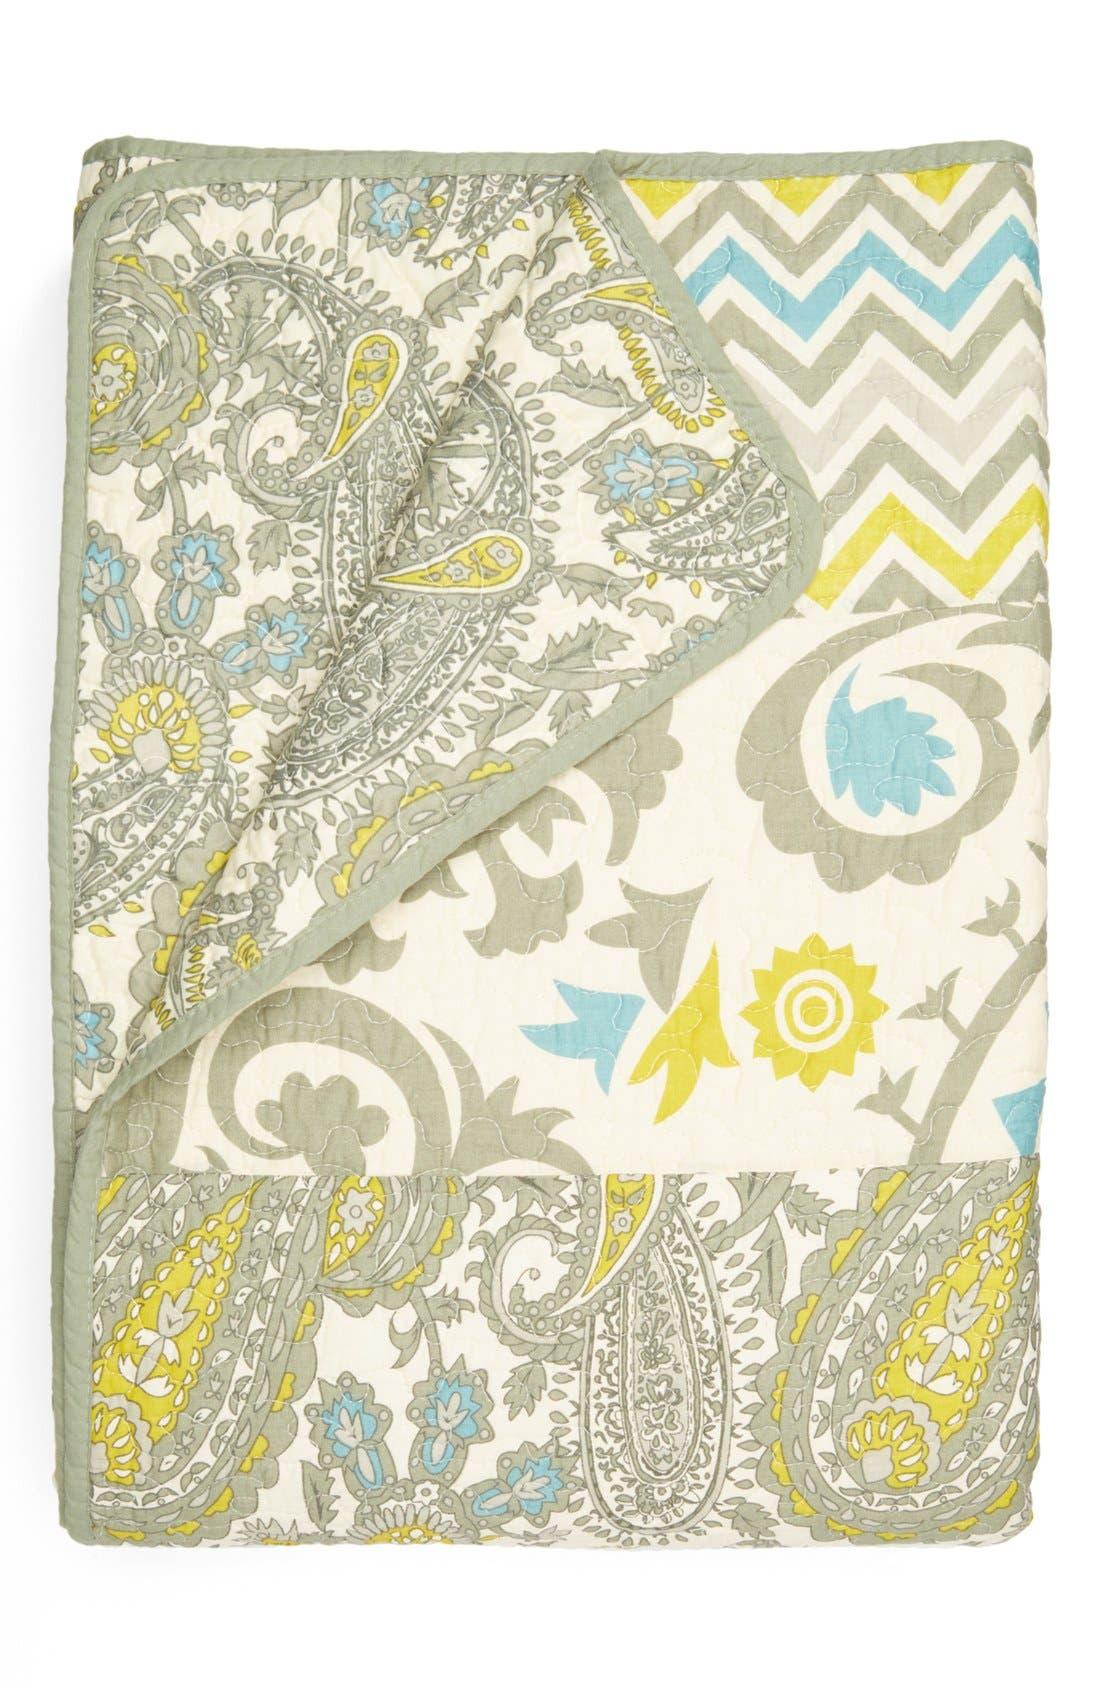 HEDAYA HOME FASHIONS,                             'Verano' Quilt,                             Alternate thumbnail 3, color,                             020